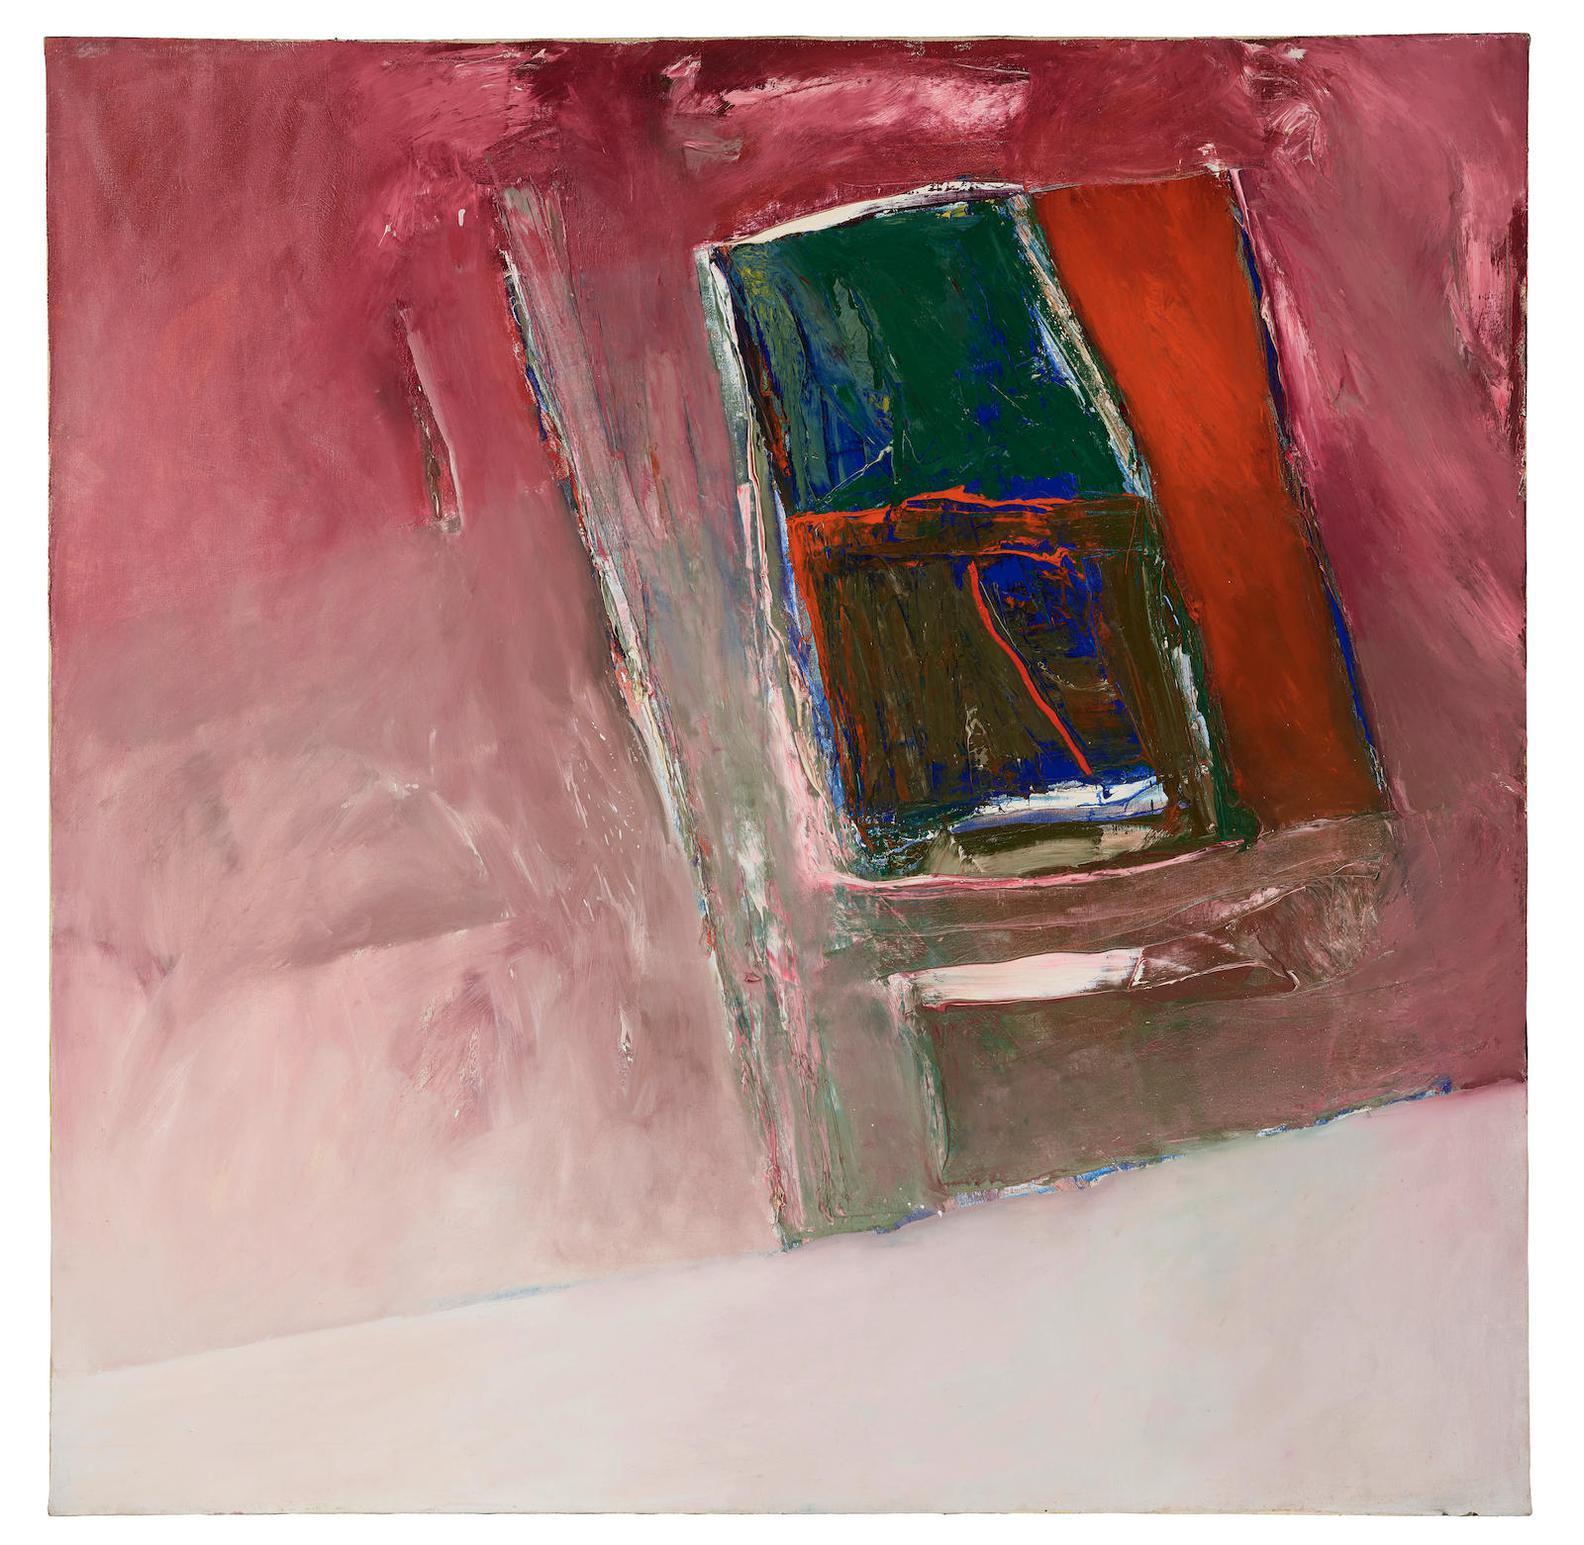 Manuel Neri-Window Series No. 13-1959